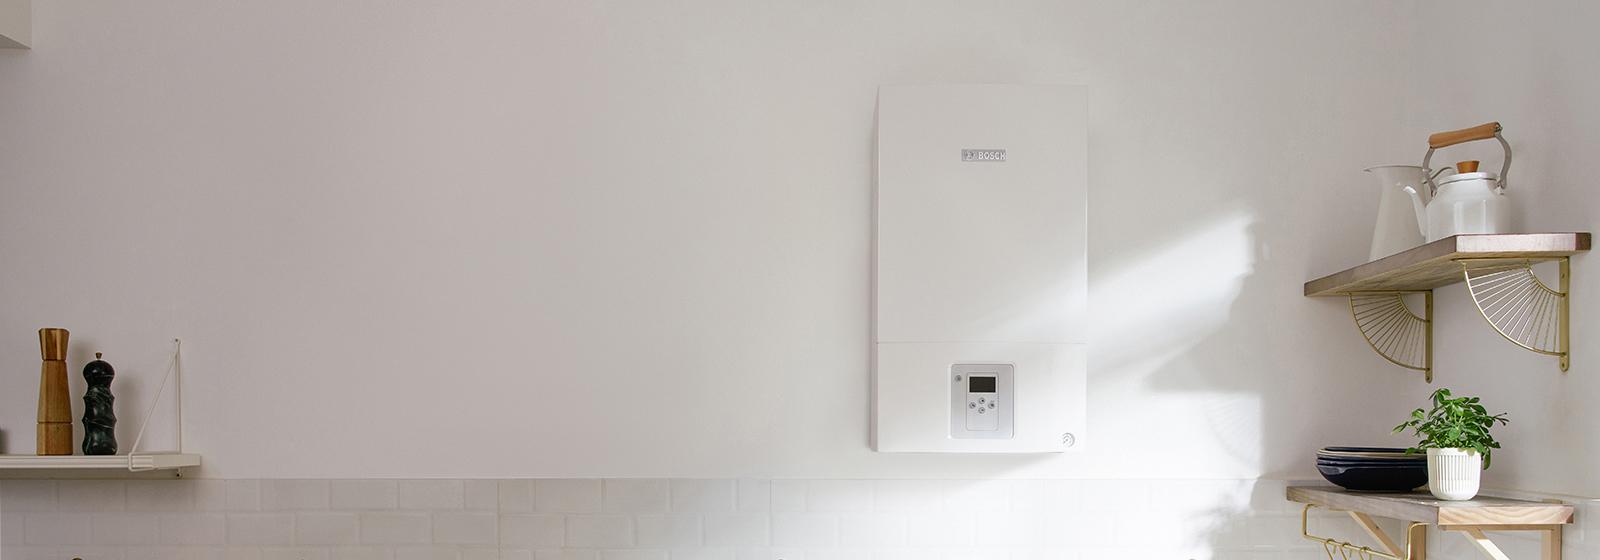 Regular System Wall-Hung Boilers